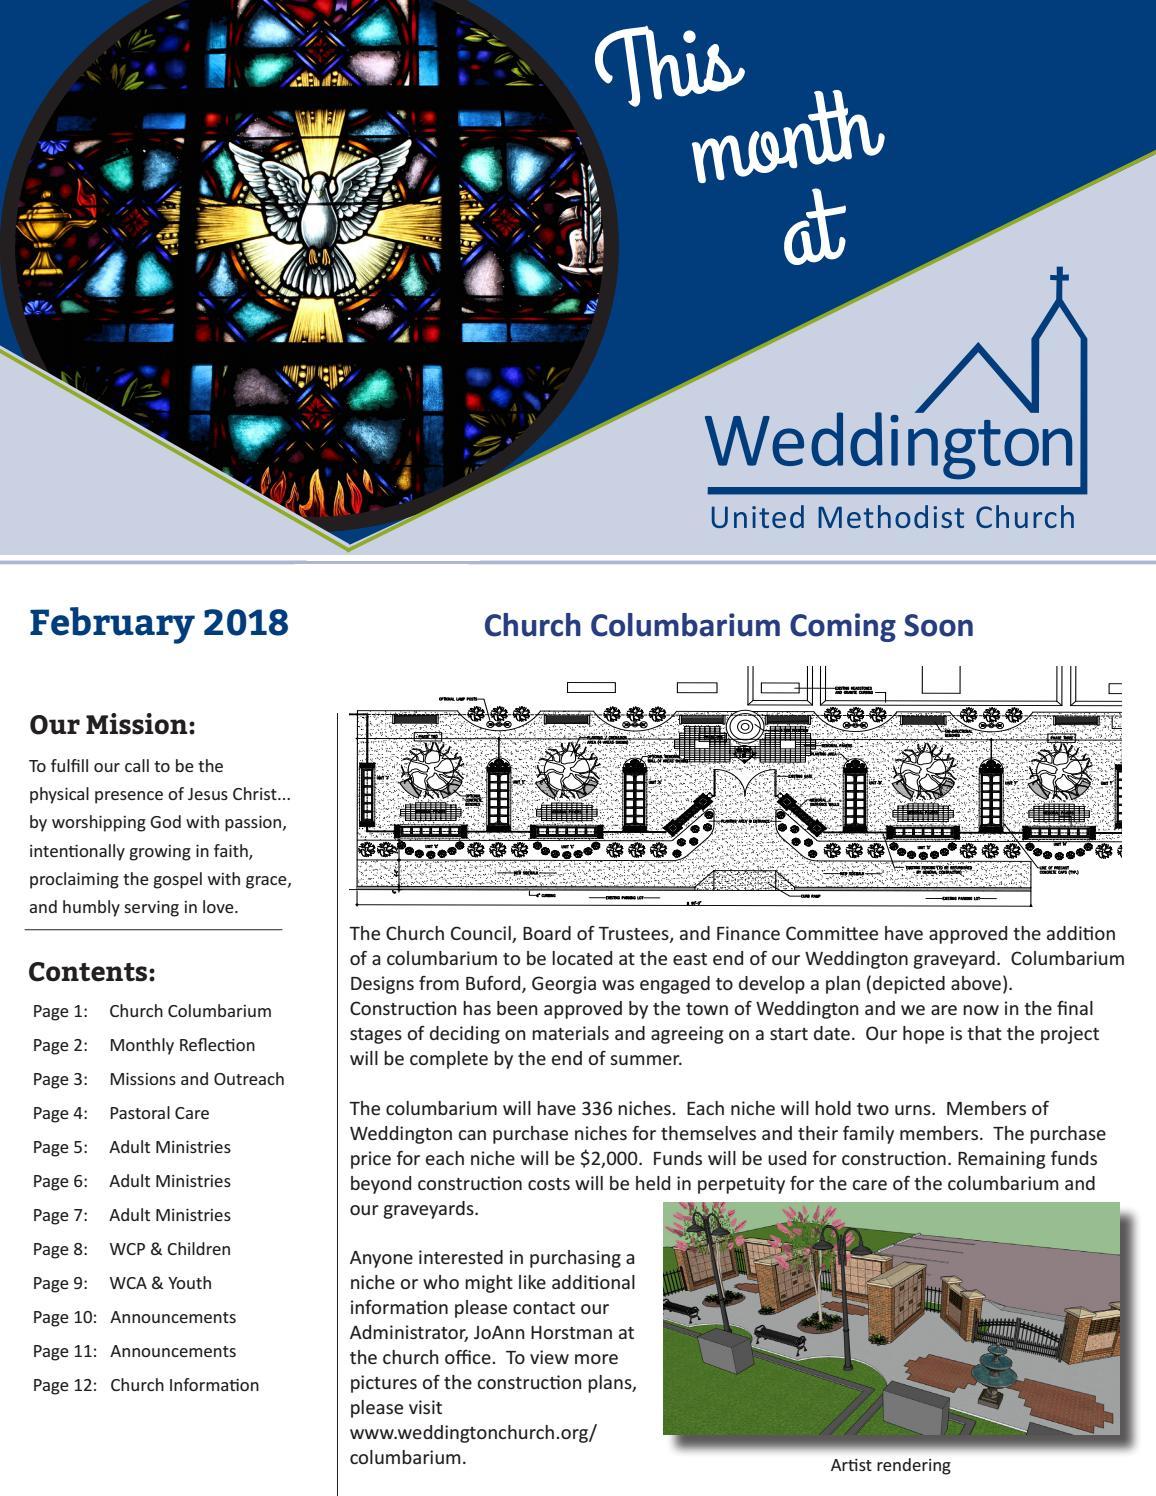 February 2018 Newsletter by Weddington United Methodist